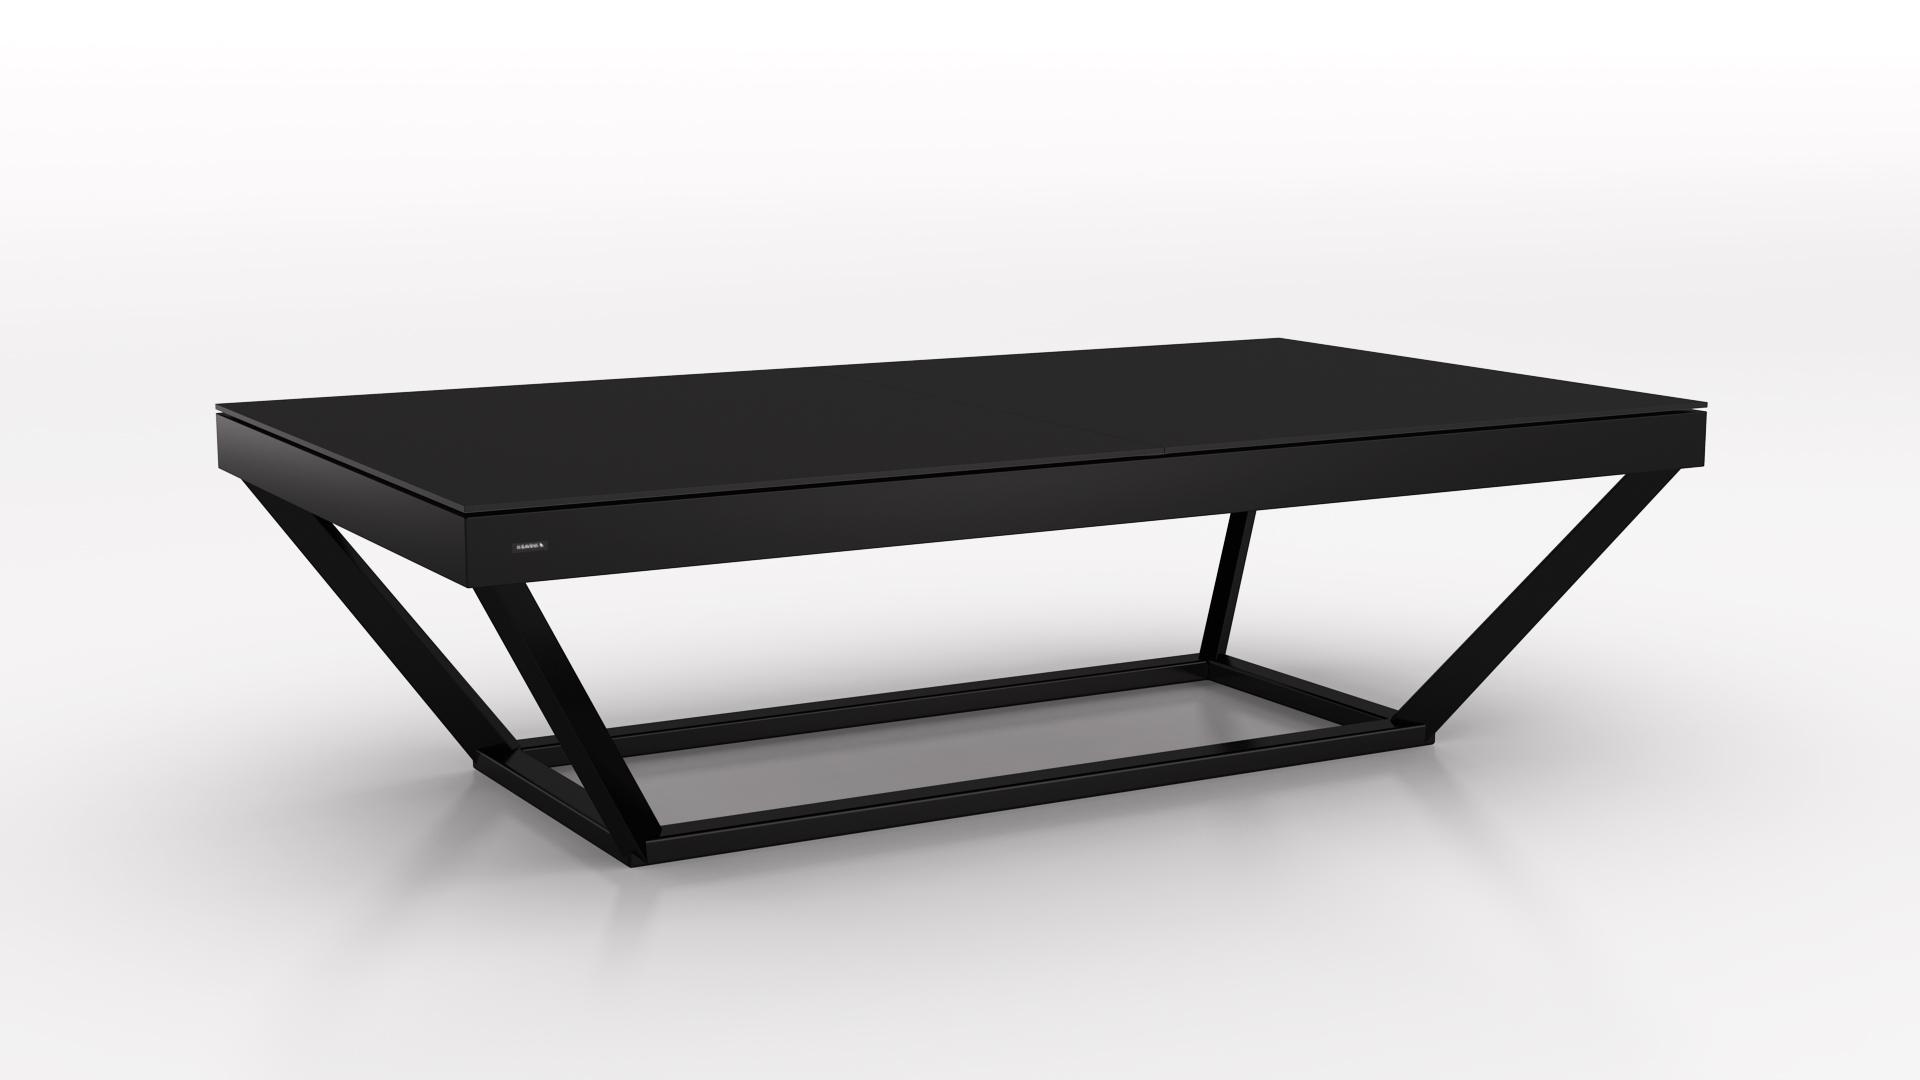 Enjoyable Vitro Convertible Pool Table Dining Table Combo Luxury Download Free Architecture Designs Aeocymadebymaigaardcom